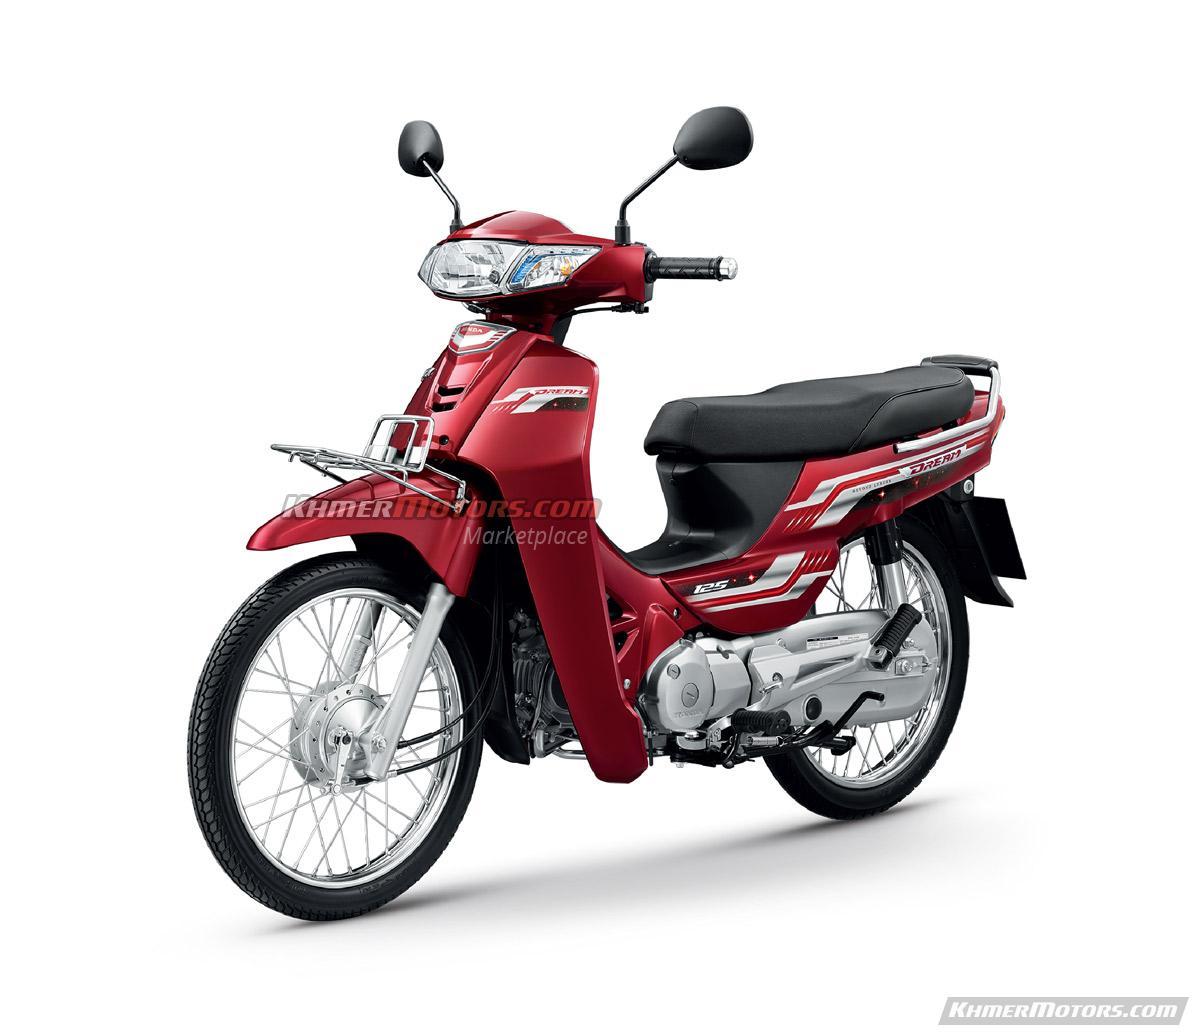 Honda Dream 2017 [Price updated] - Khmer Motors